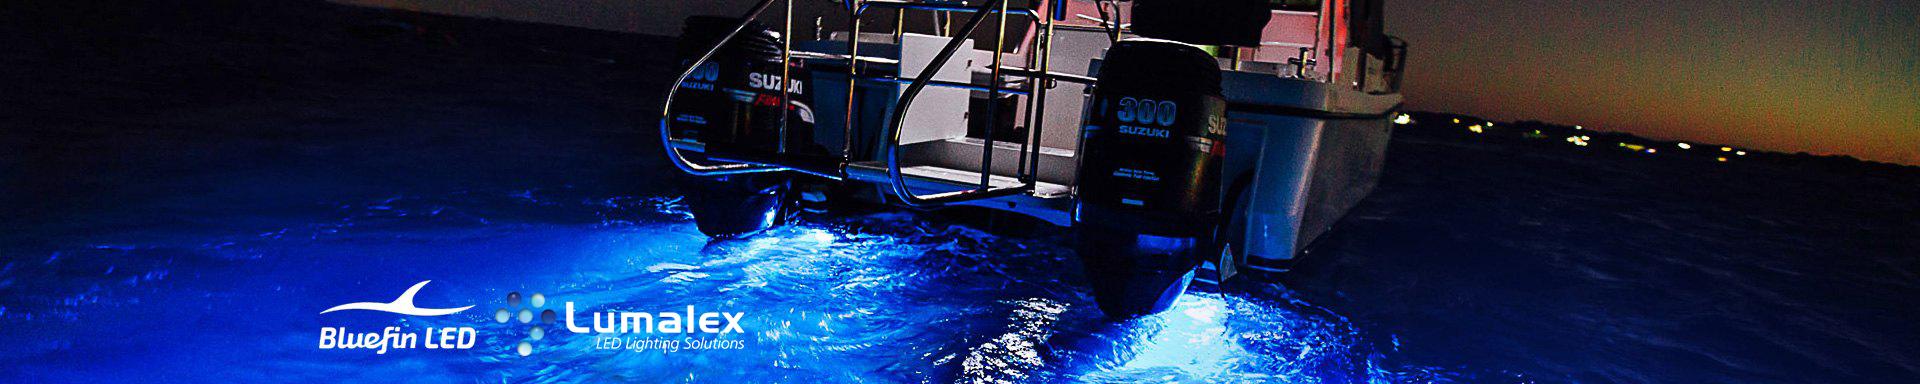 bluefin-lumalex-led-u_0